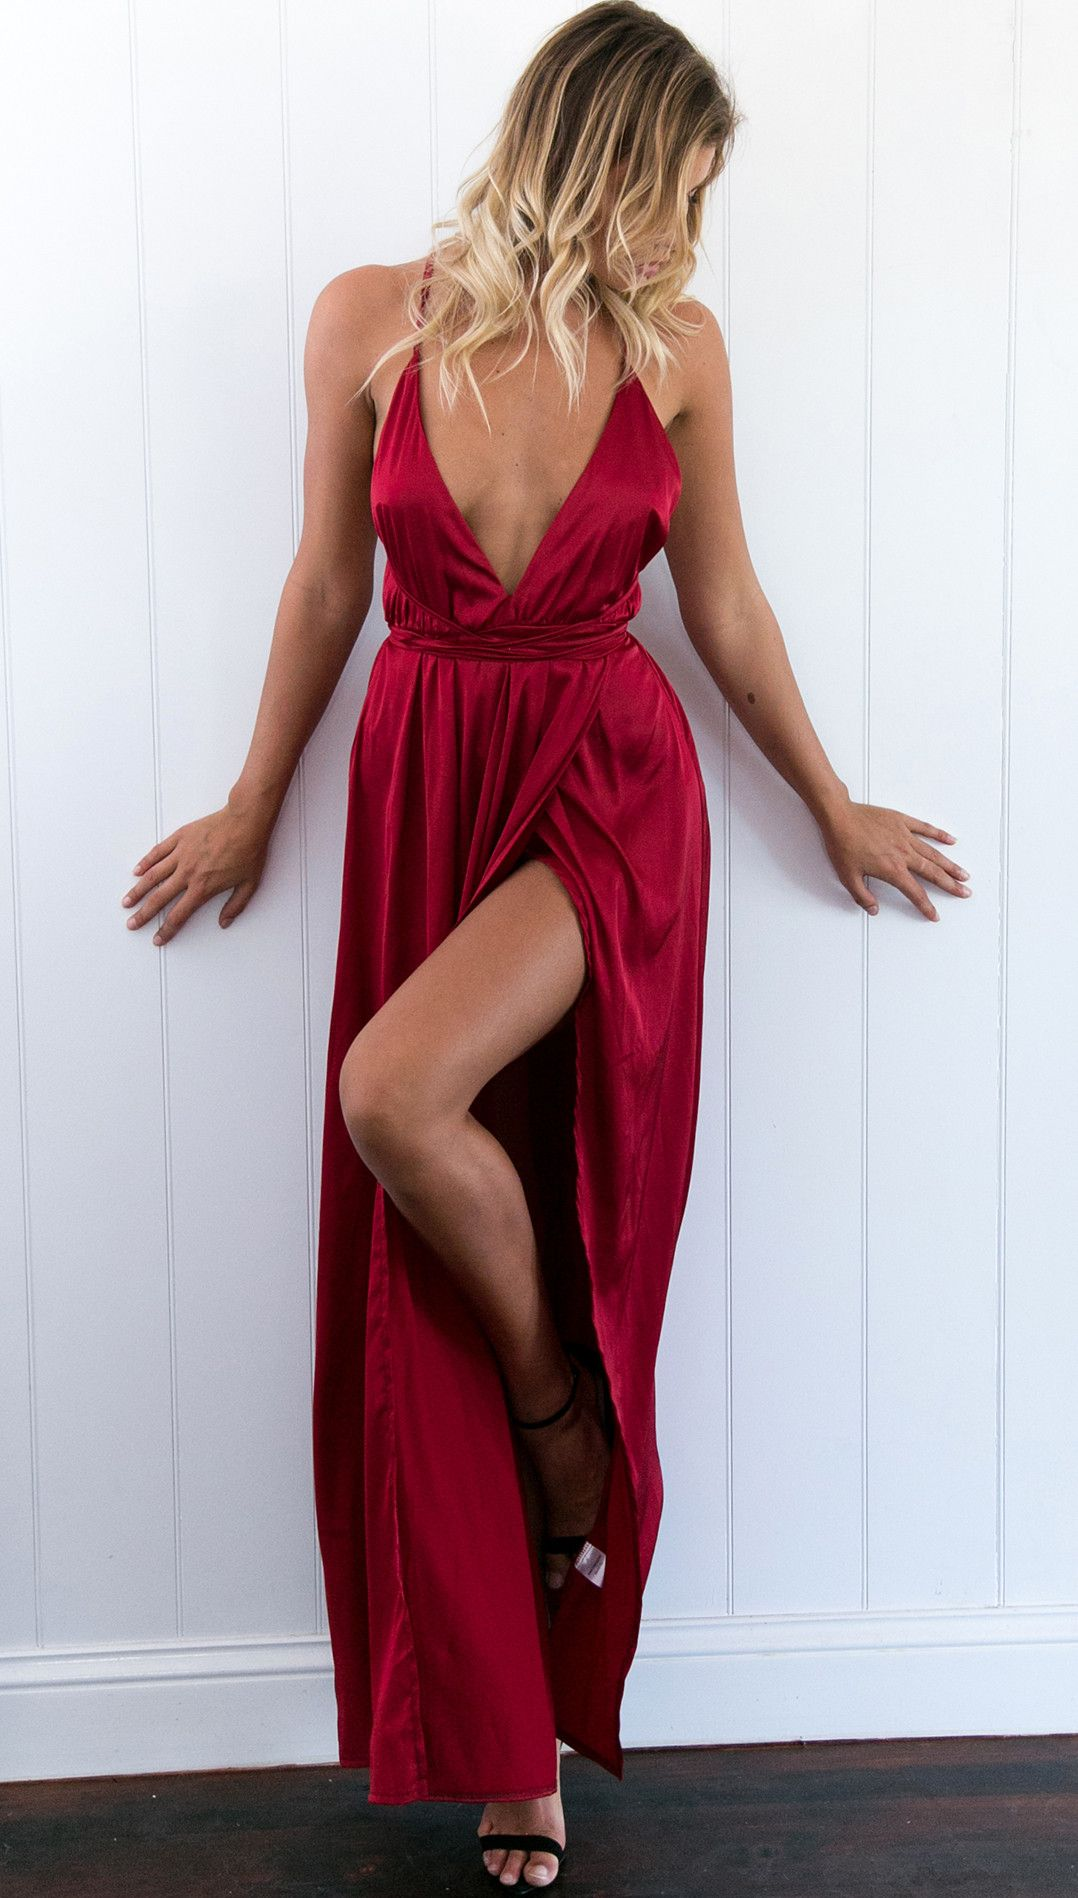 c775f689a87 Burgundy High Slit Prom Dress